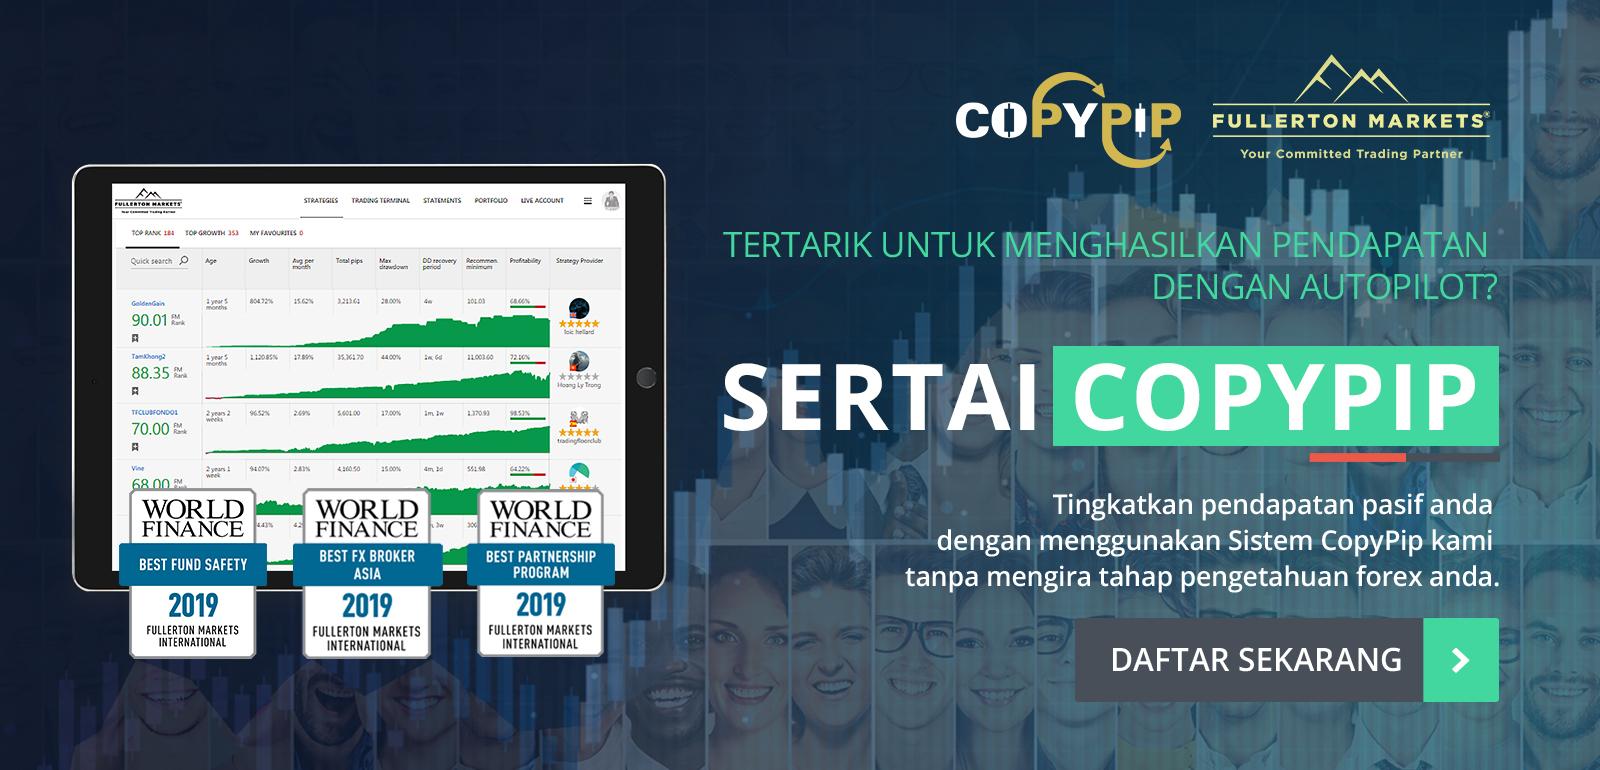 CopyPip_strategy_followers-MY.jpg